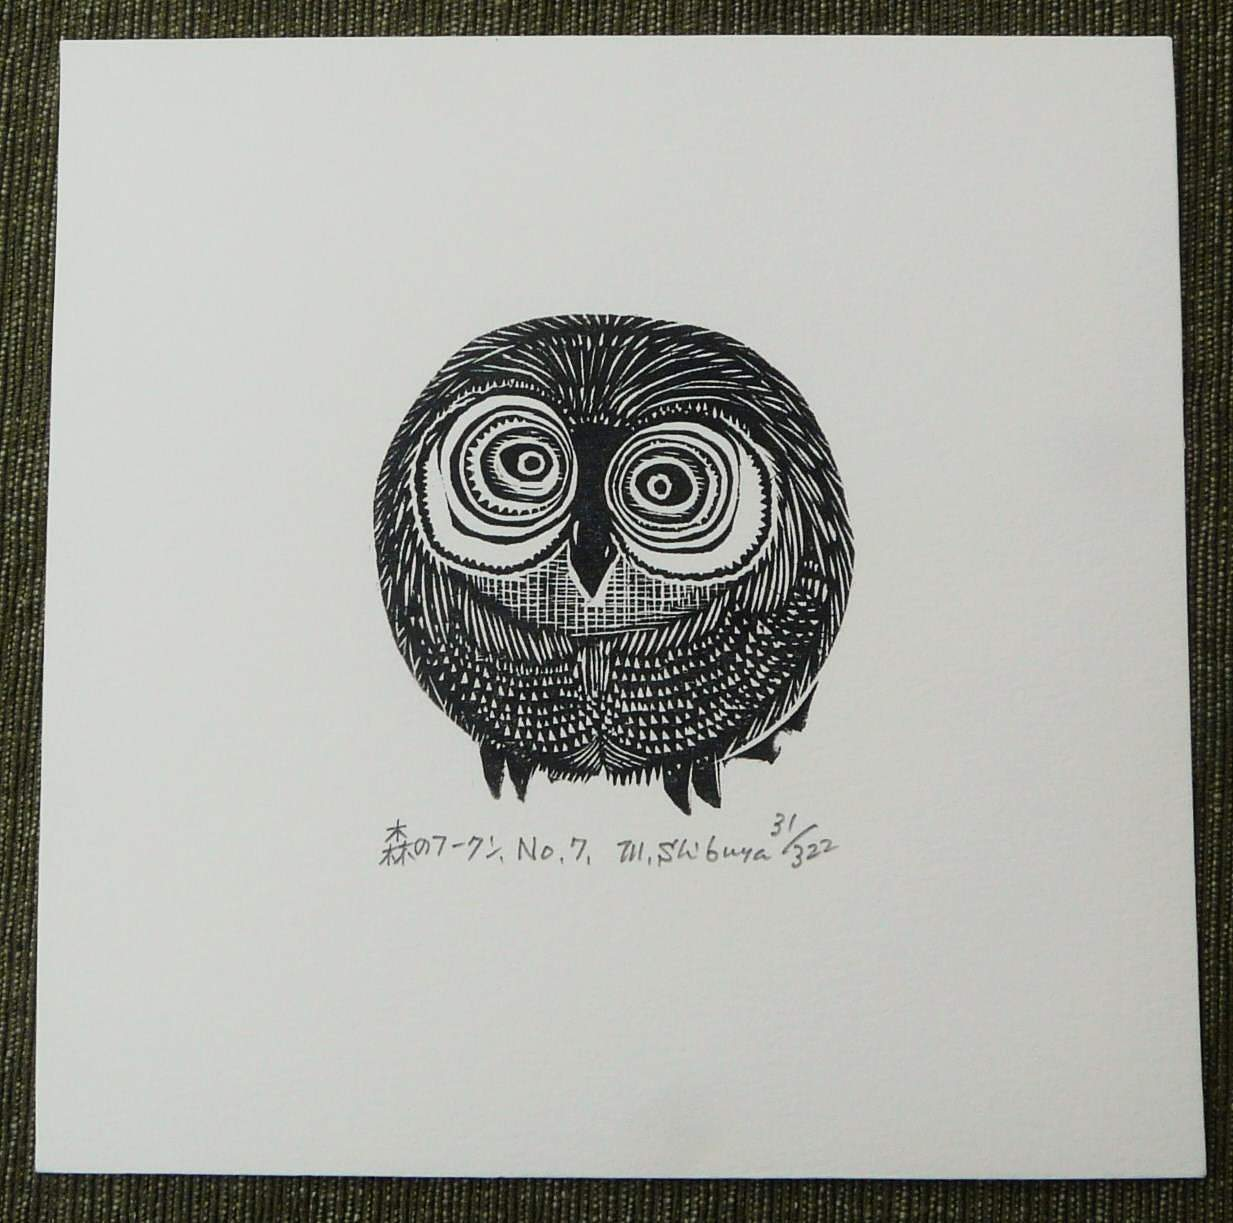 #P4280 FOREST OWL By MASAKI SHIBUYA